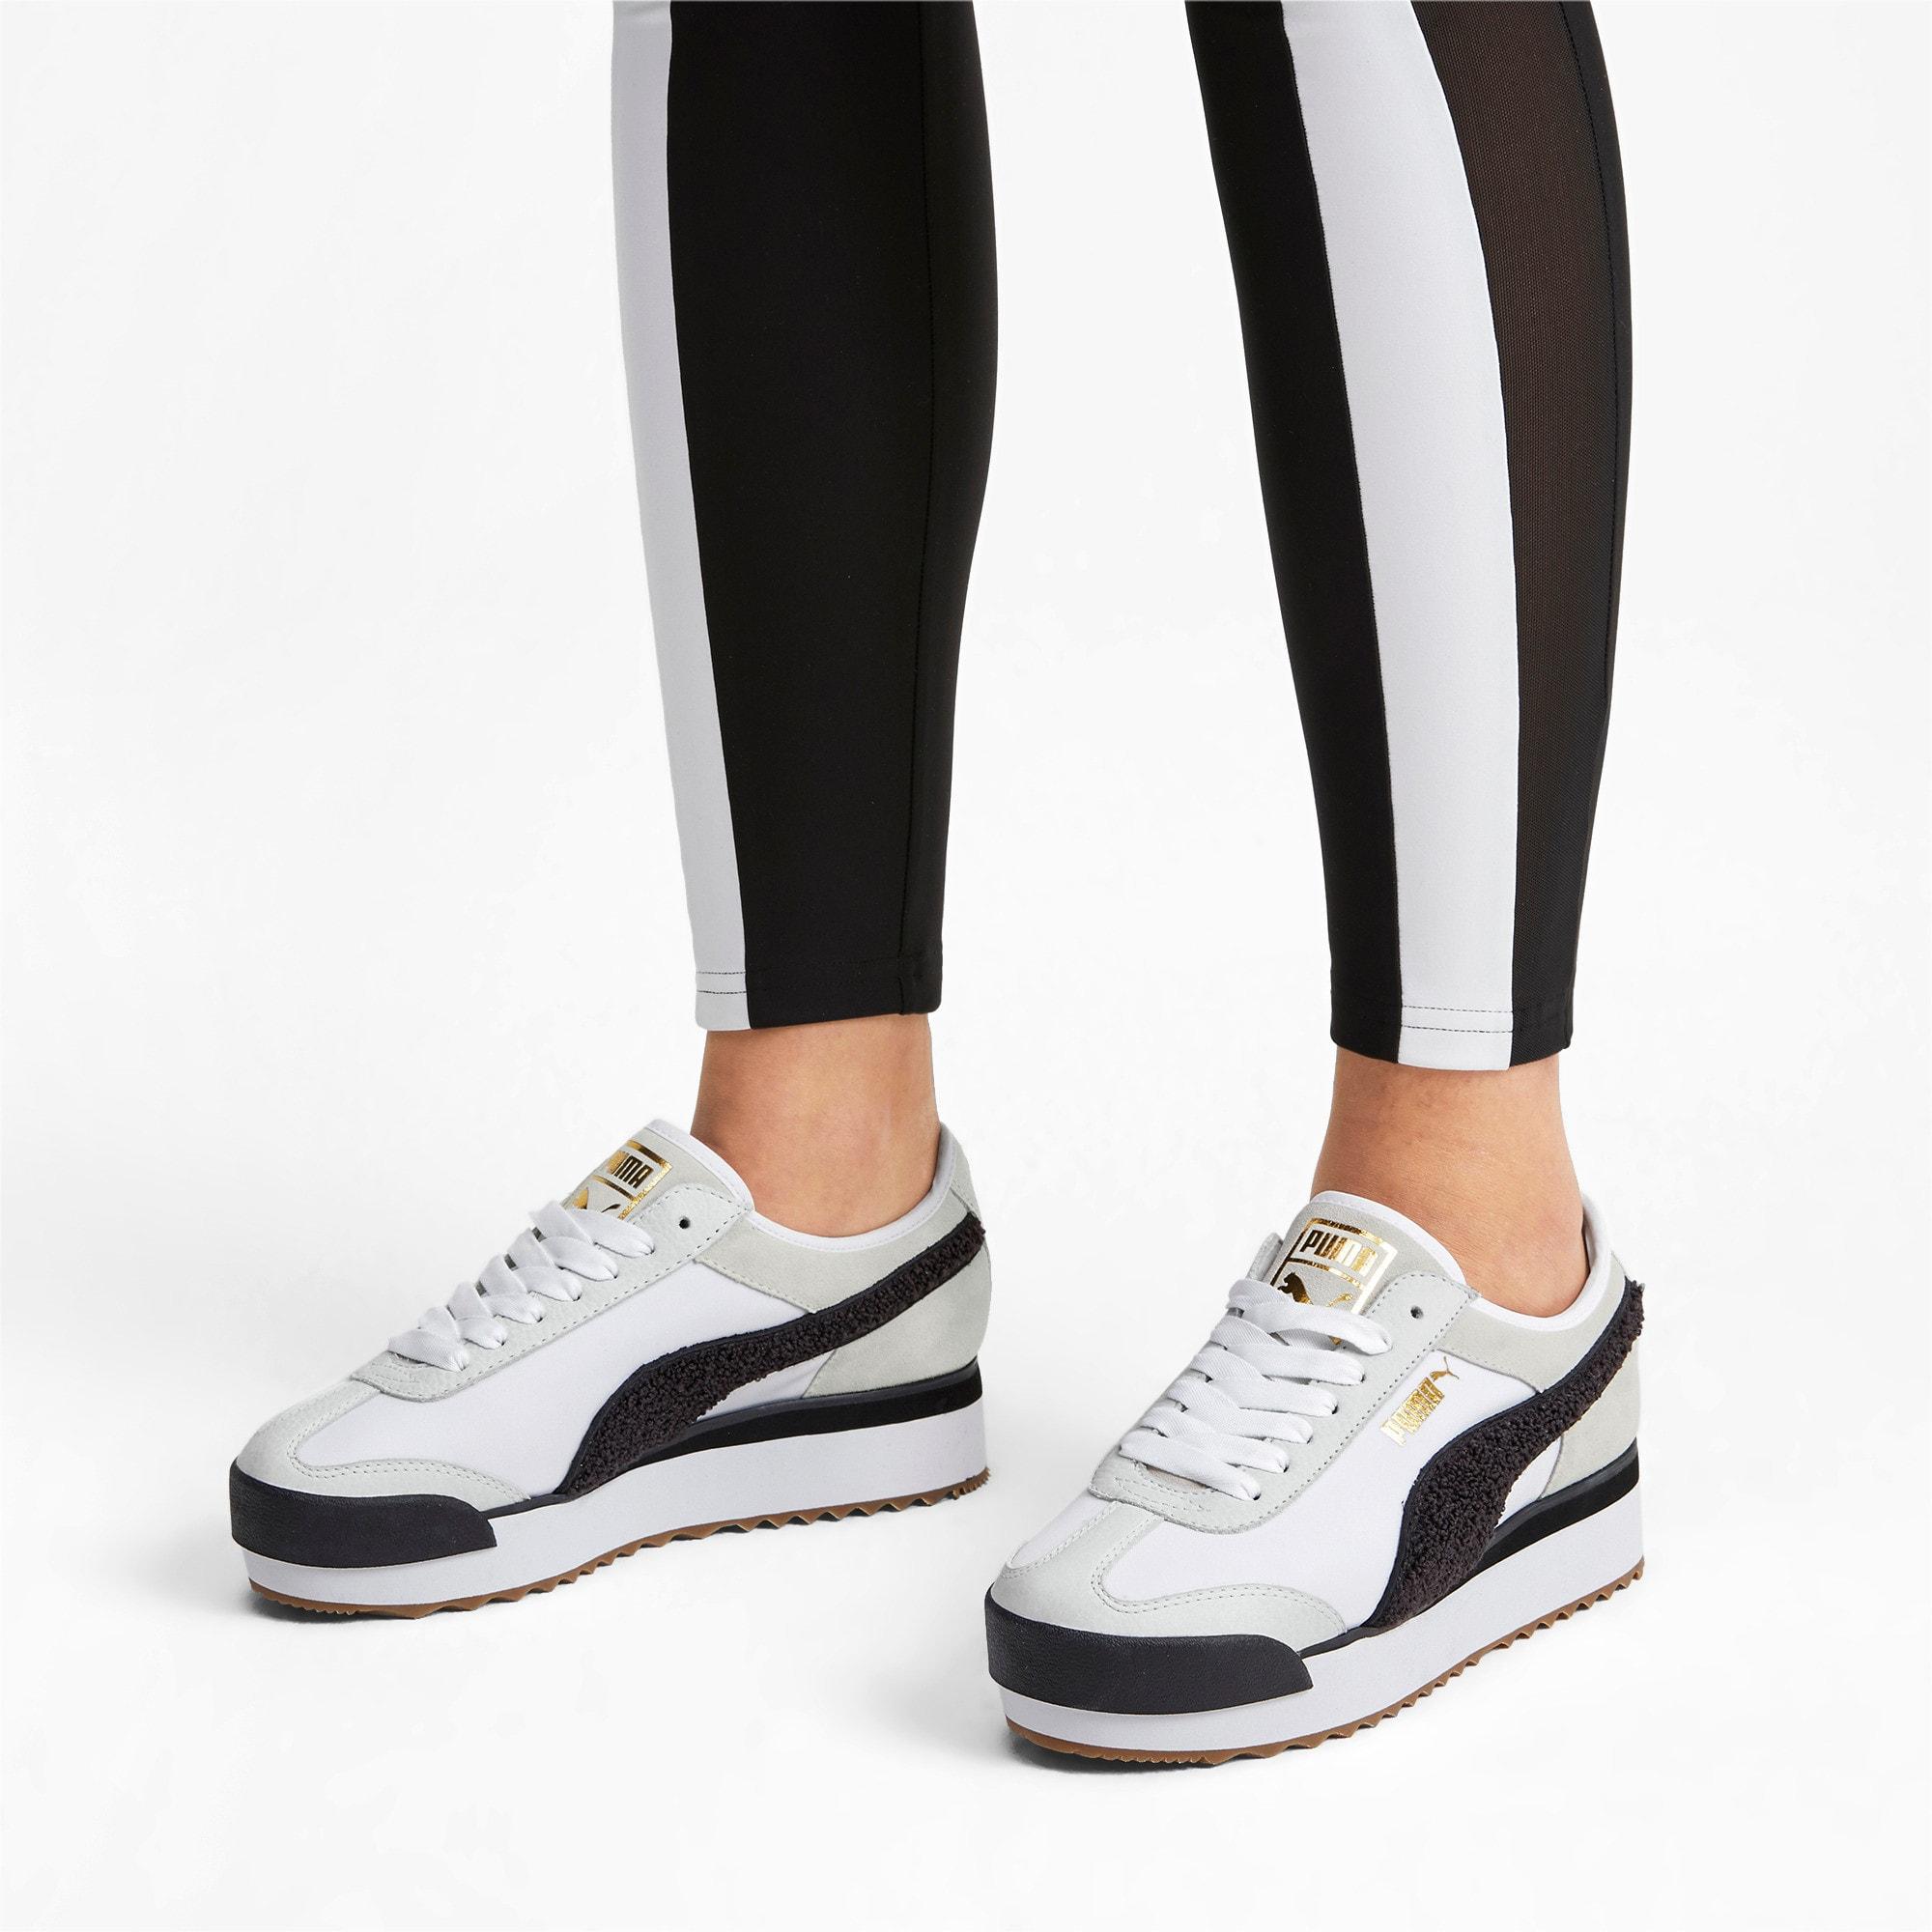 Thumbnail 2 of Roma Amor Heritage Women's Sneakers, Puma White-Puma Black, medium